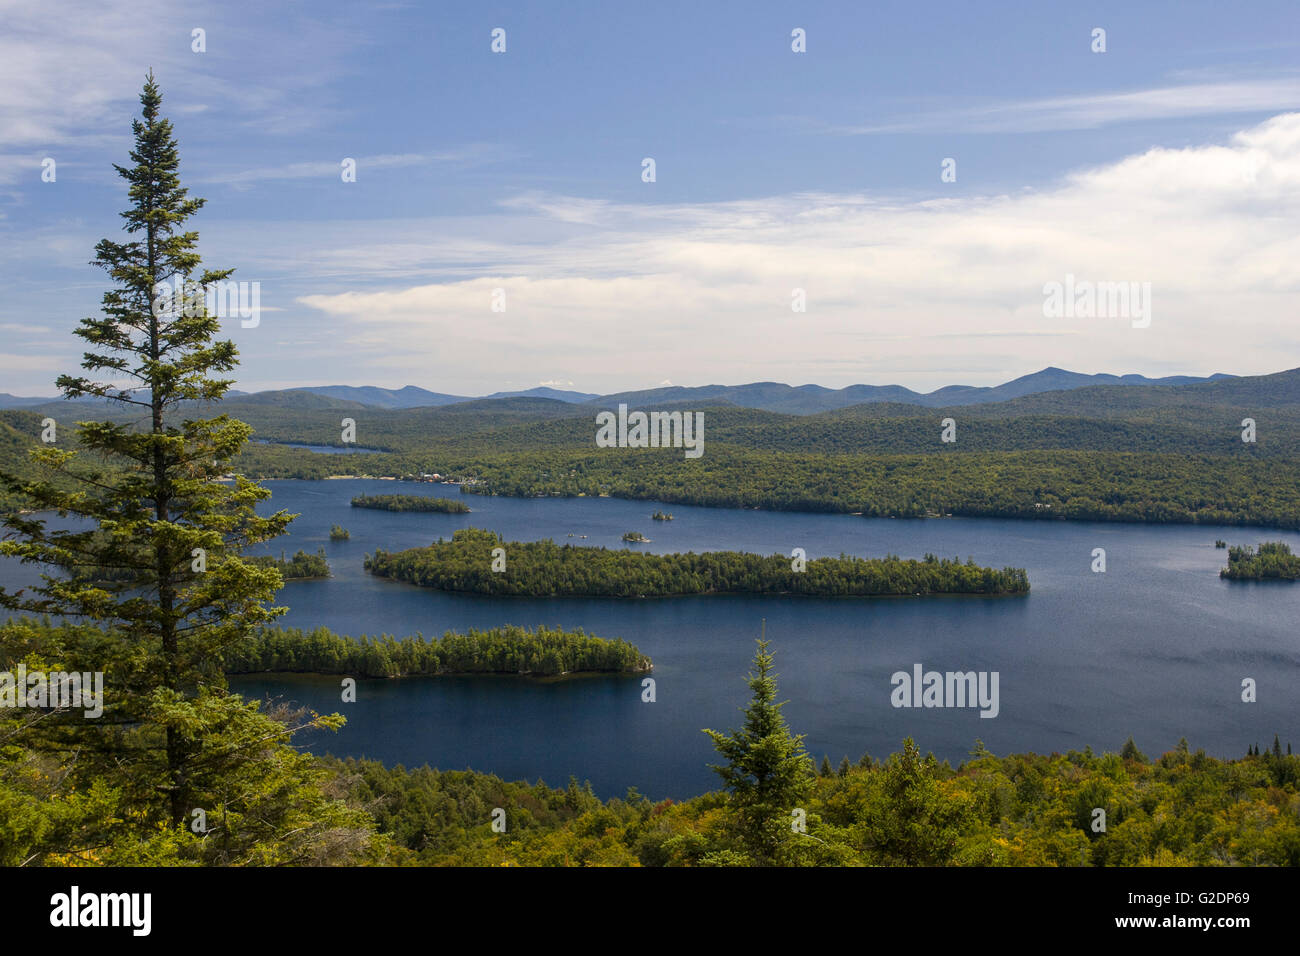 Blue Mountain Lake,Bridge,Steamboat,Adirondack Mountain Photo